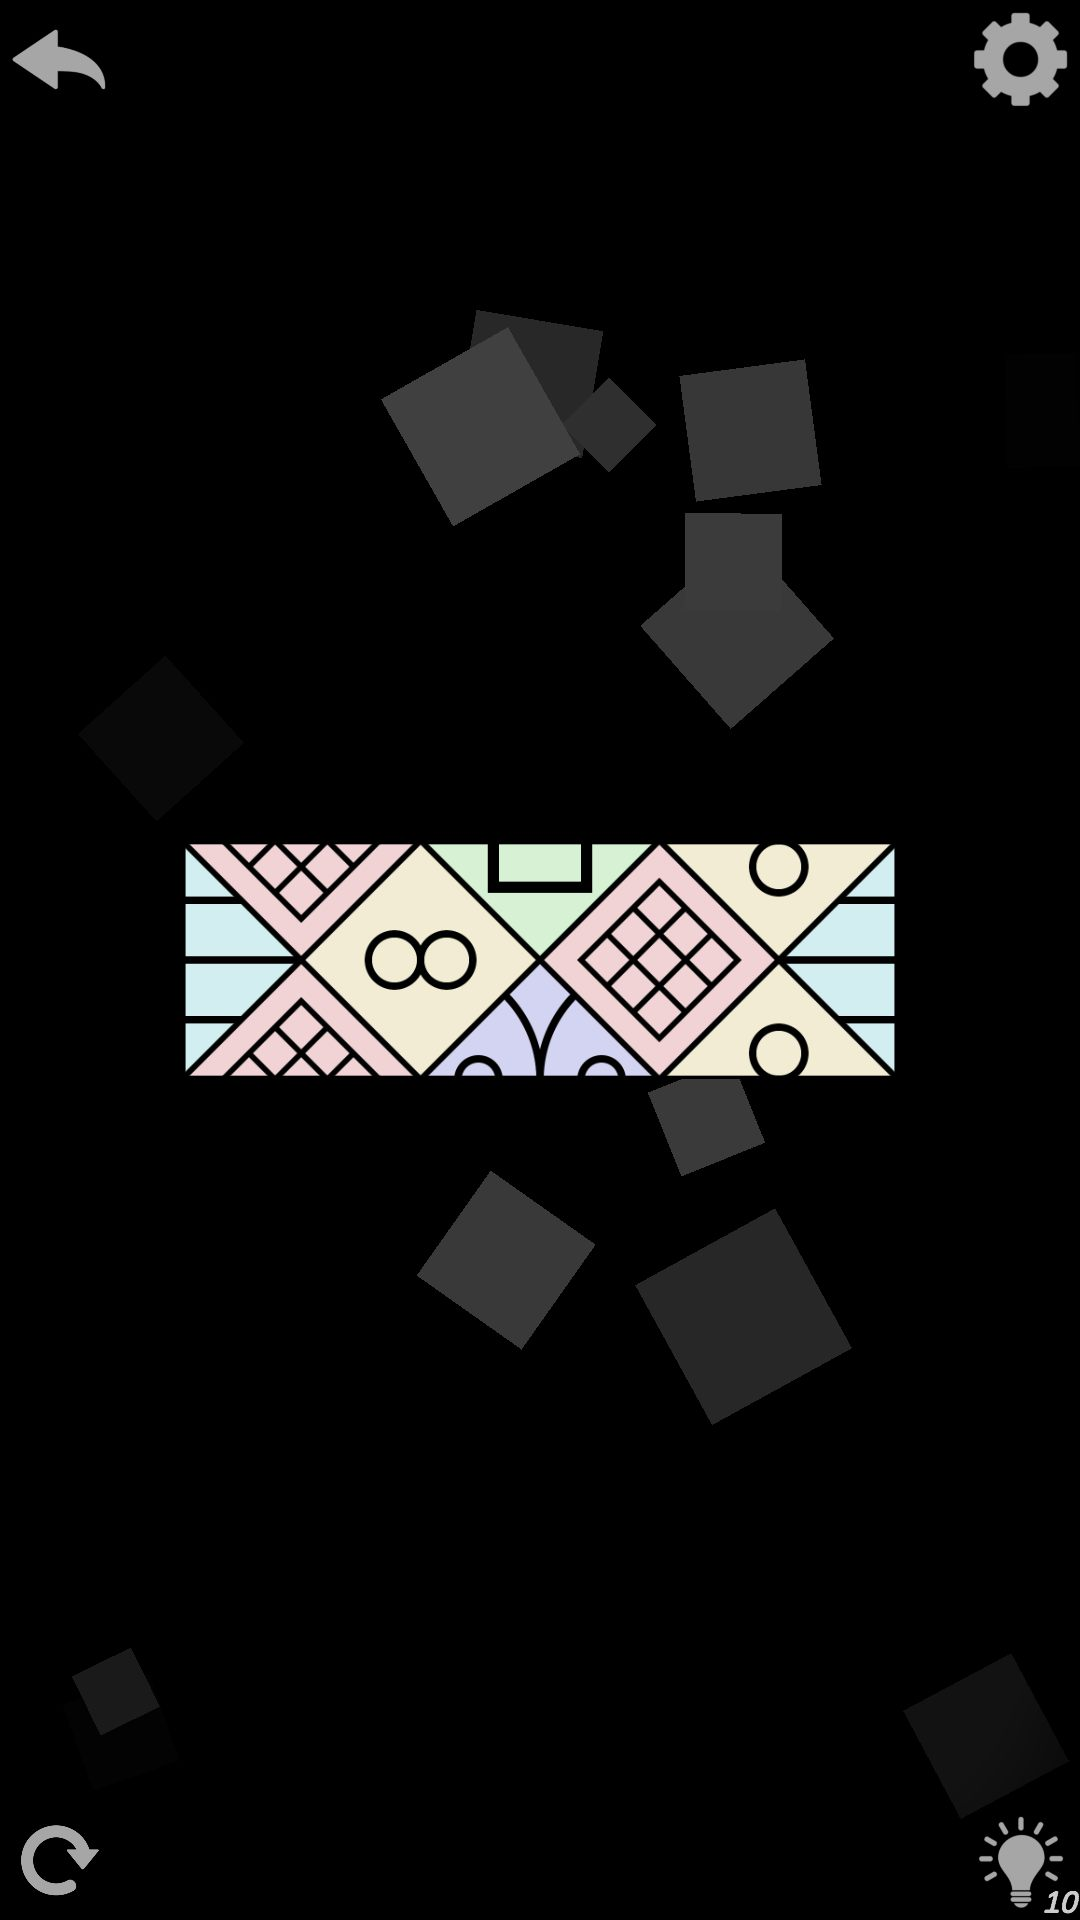 3 уровень AuroraBound - игра с узорами